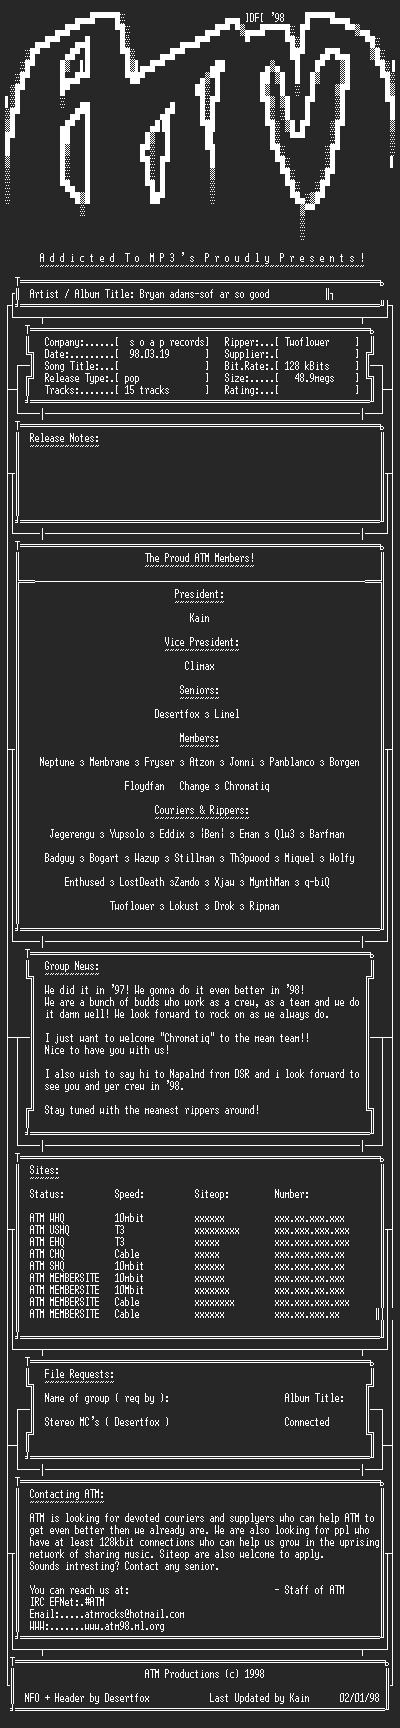 NFO file for Bryan_Adams-Sof_Ar_So_Good-ATM